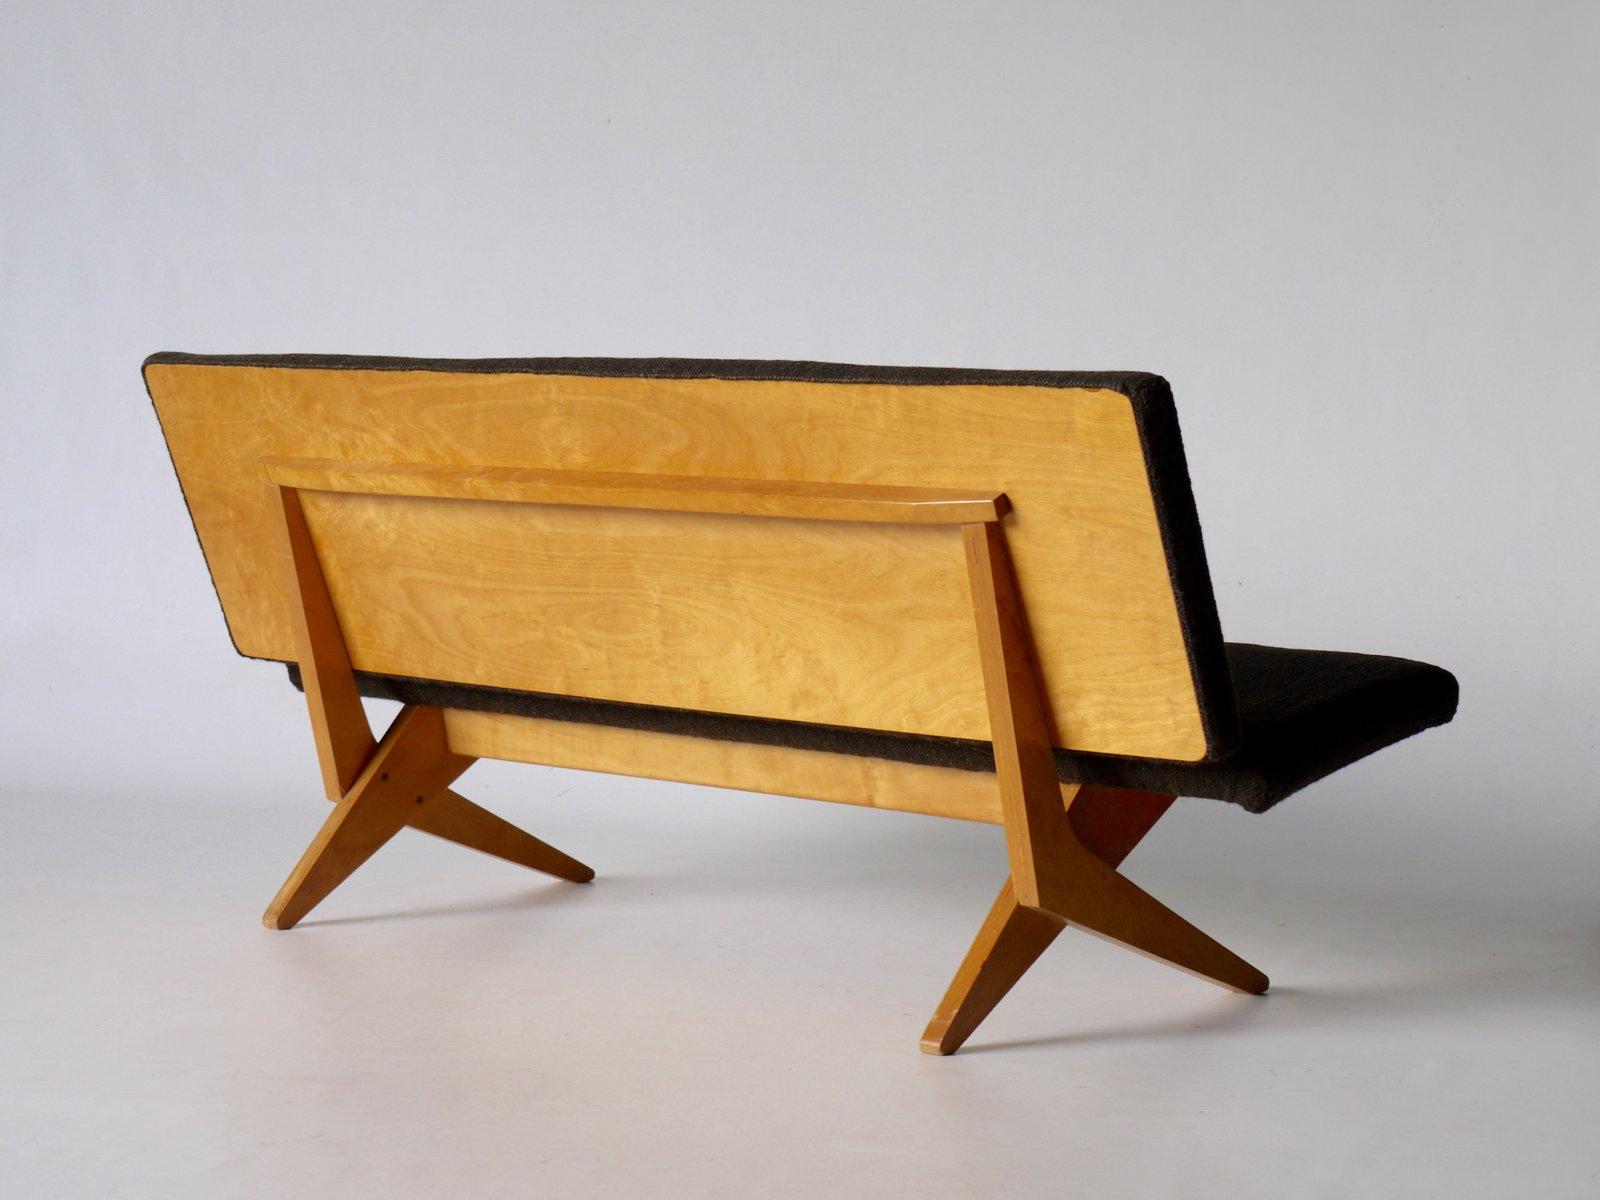 sofa for van singapore living room ideas with grey leather sofas scissor by jan grunsven ums pastoe 1950s